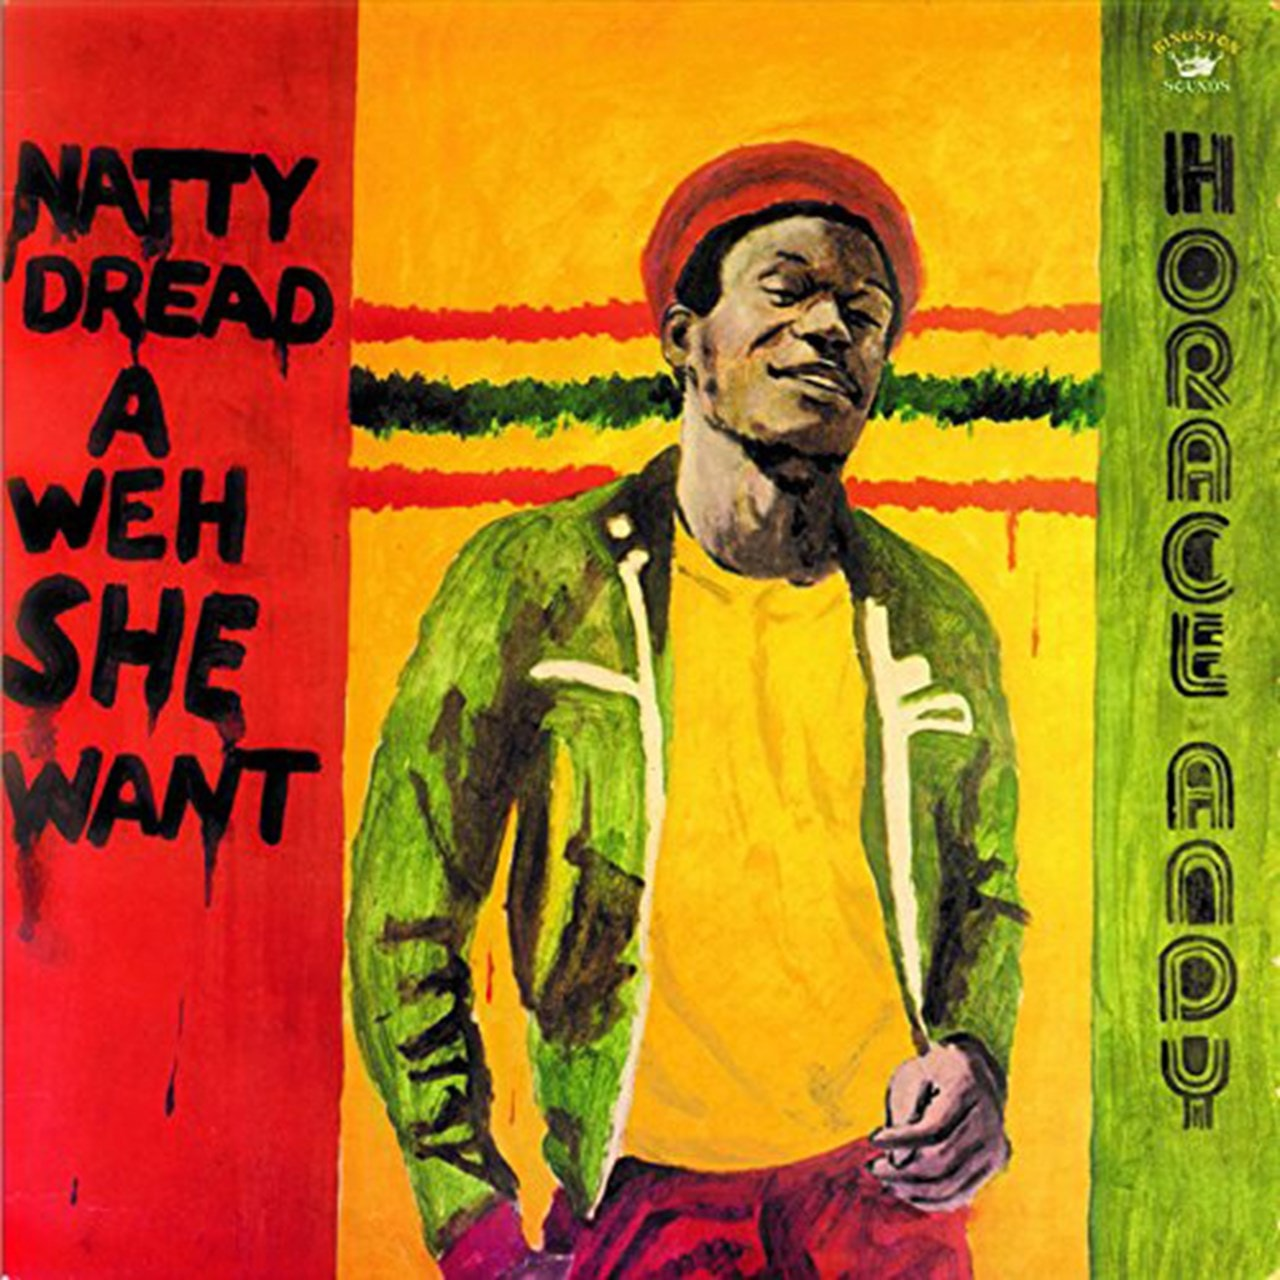 Natty Dread a Weh She Want - 1